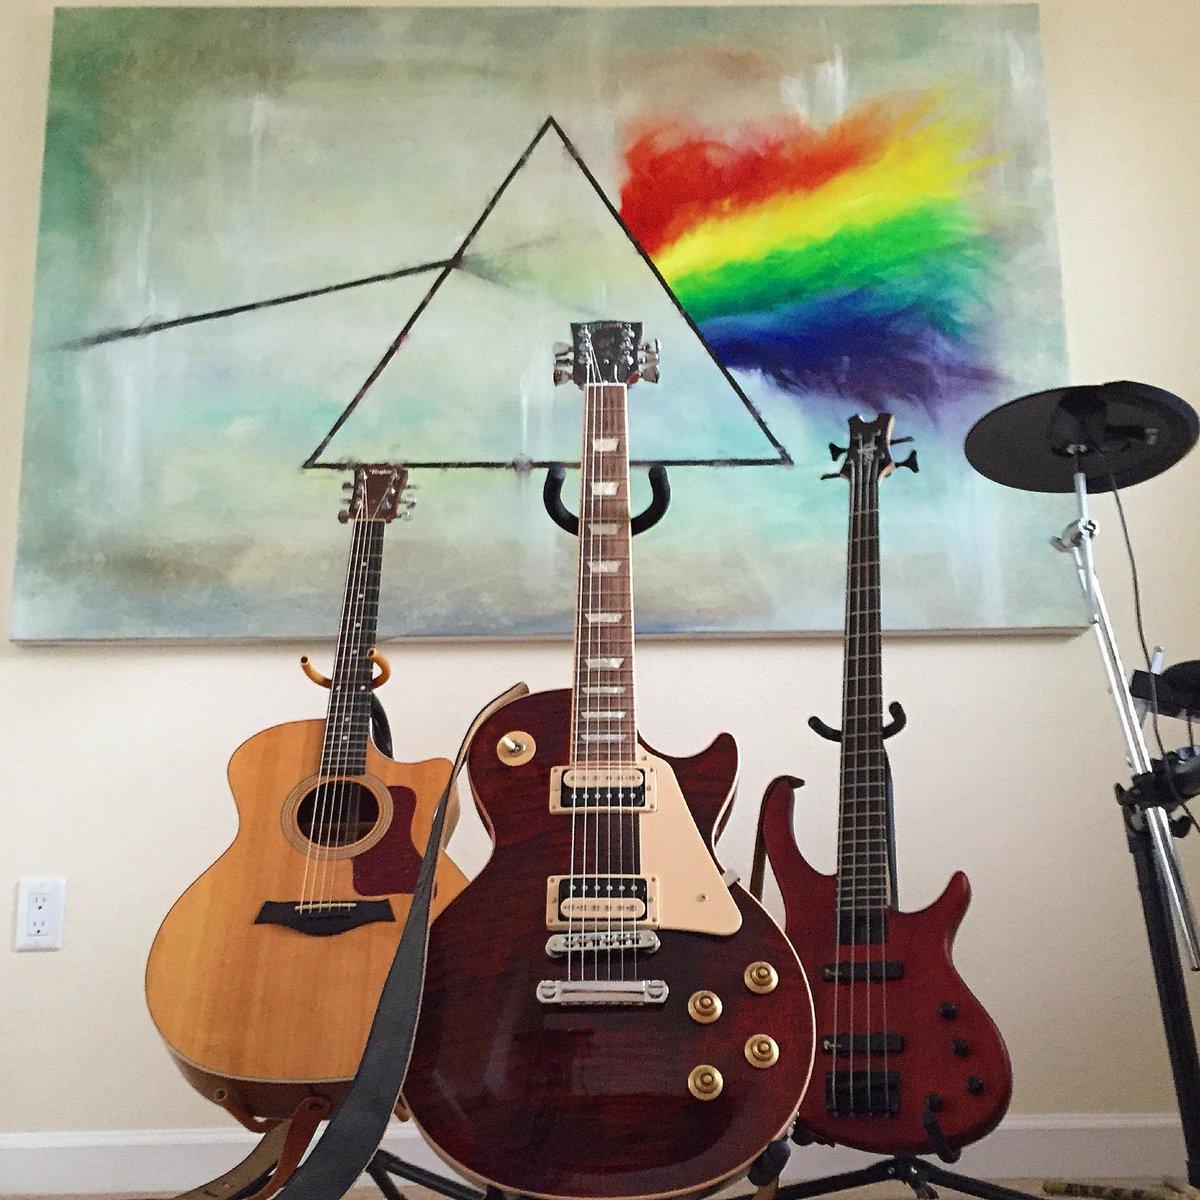 #pinkfloyd #darksideofthemoon painting for my studio... #lespaul #taylor guitars http://t.co/jJ0dW7WztB